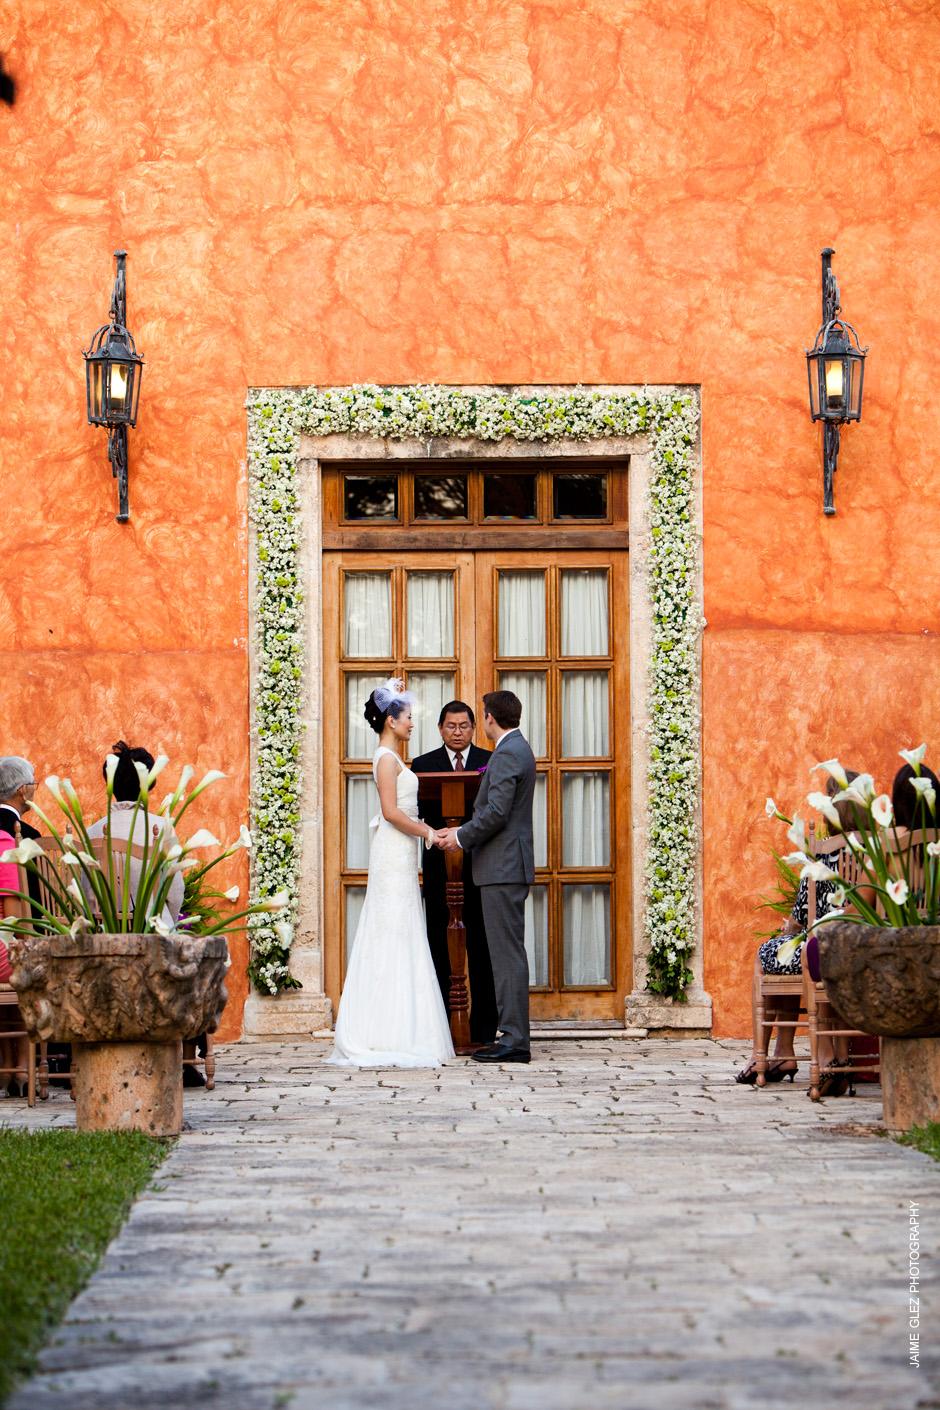 Romantic wedding in the beautiful Hacienda Xcanatun inMerida, Yucatan.